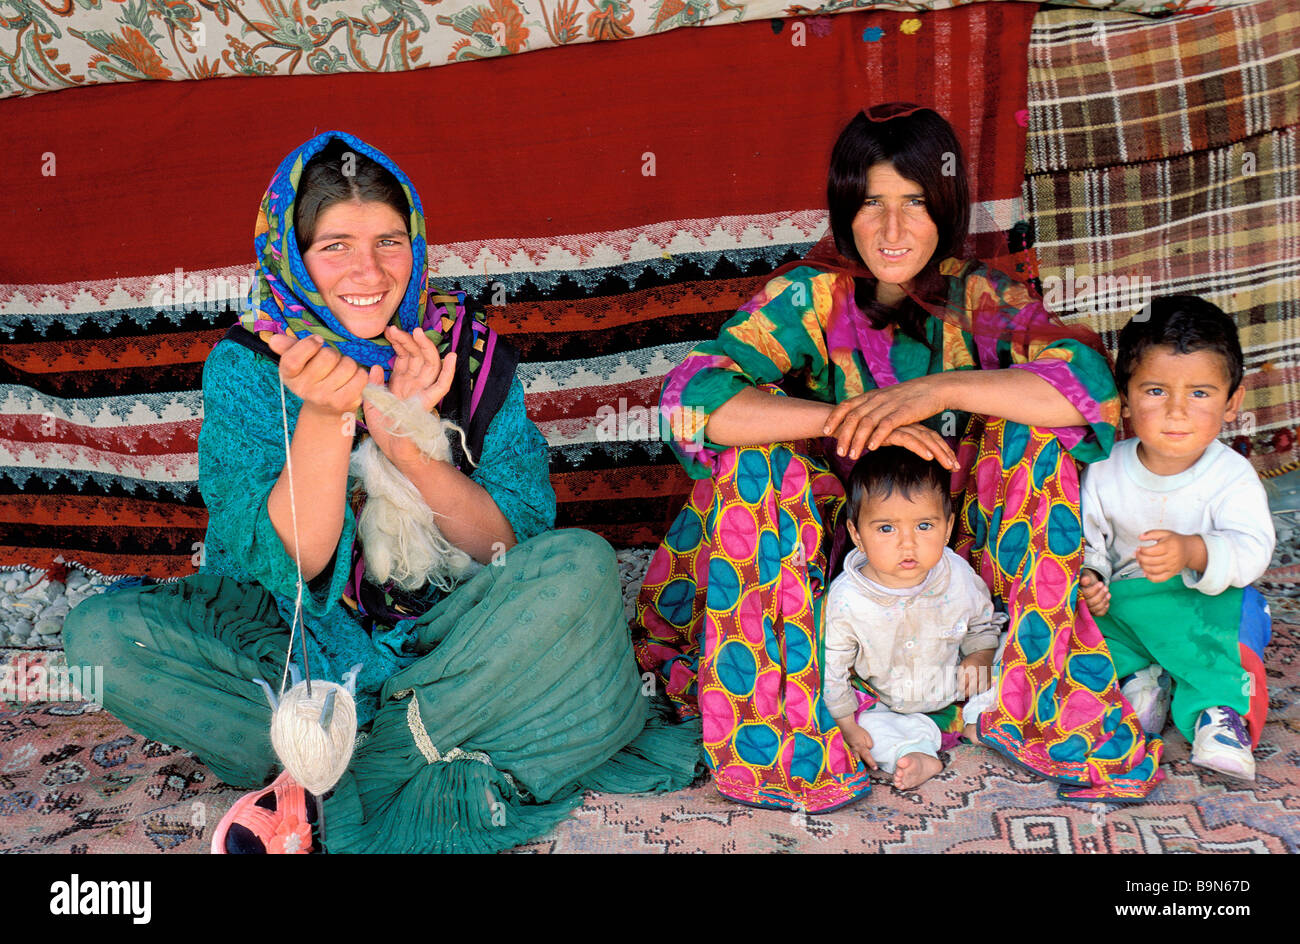 Iran, Fars Province, Qashqai Nomads - Stock Image